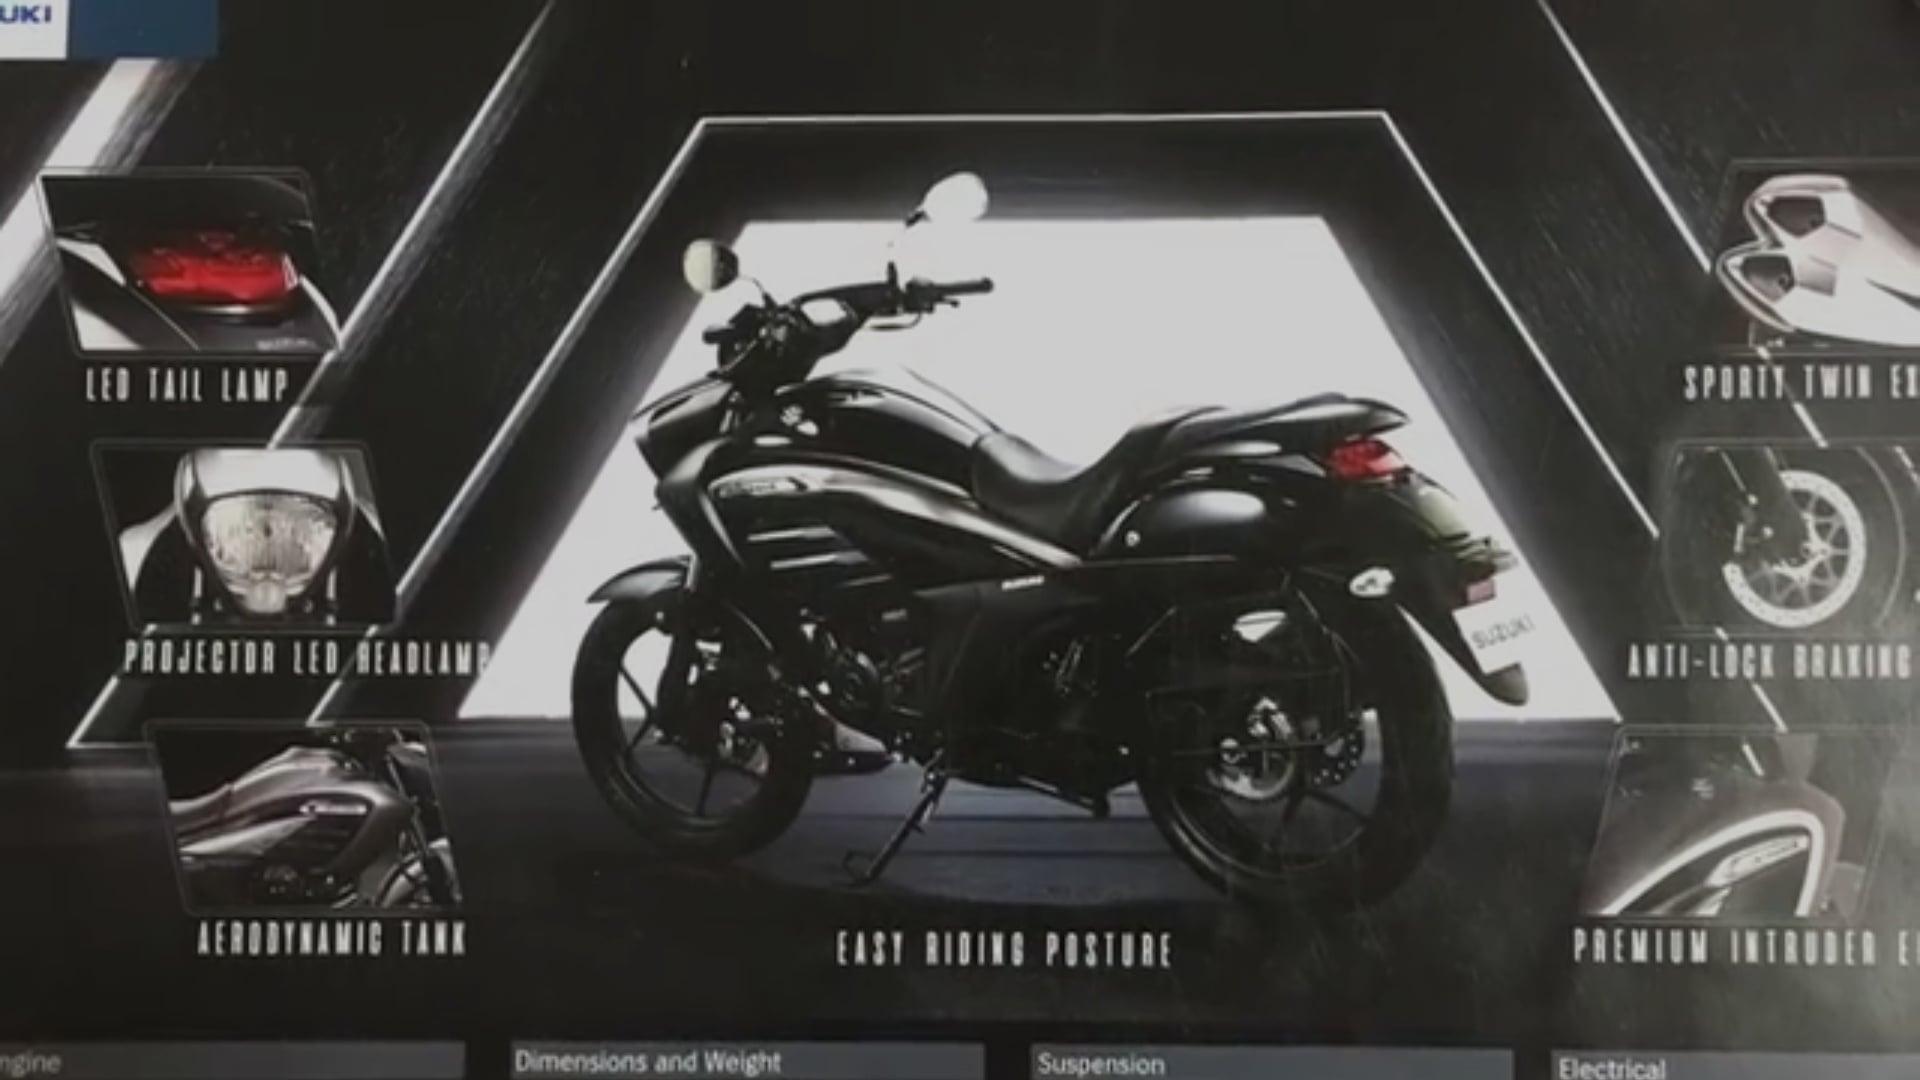 Suzuki Intruder 150 Launch Date, Price in India